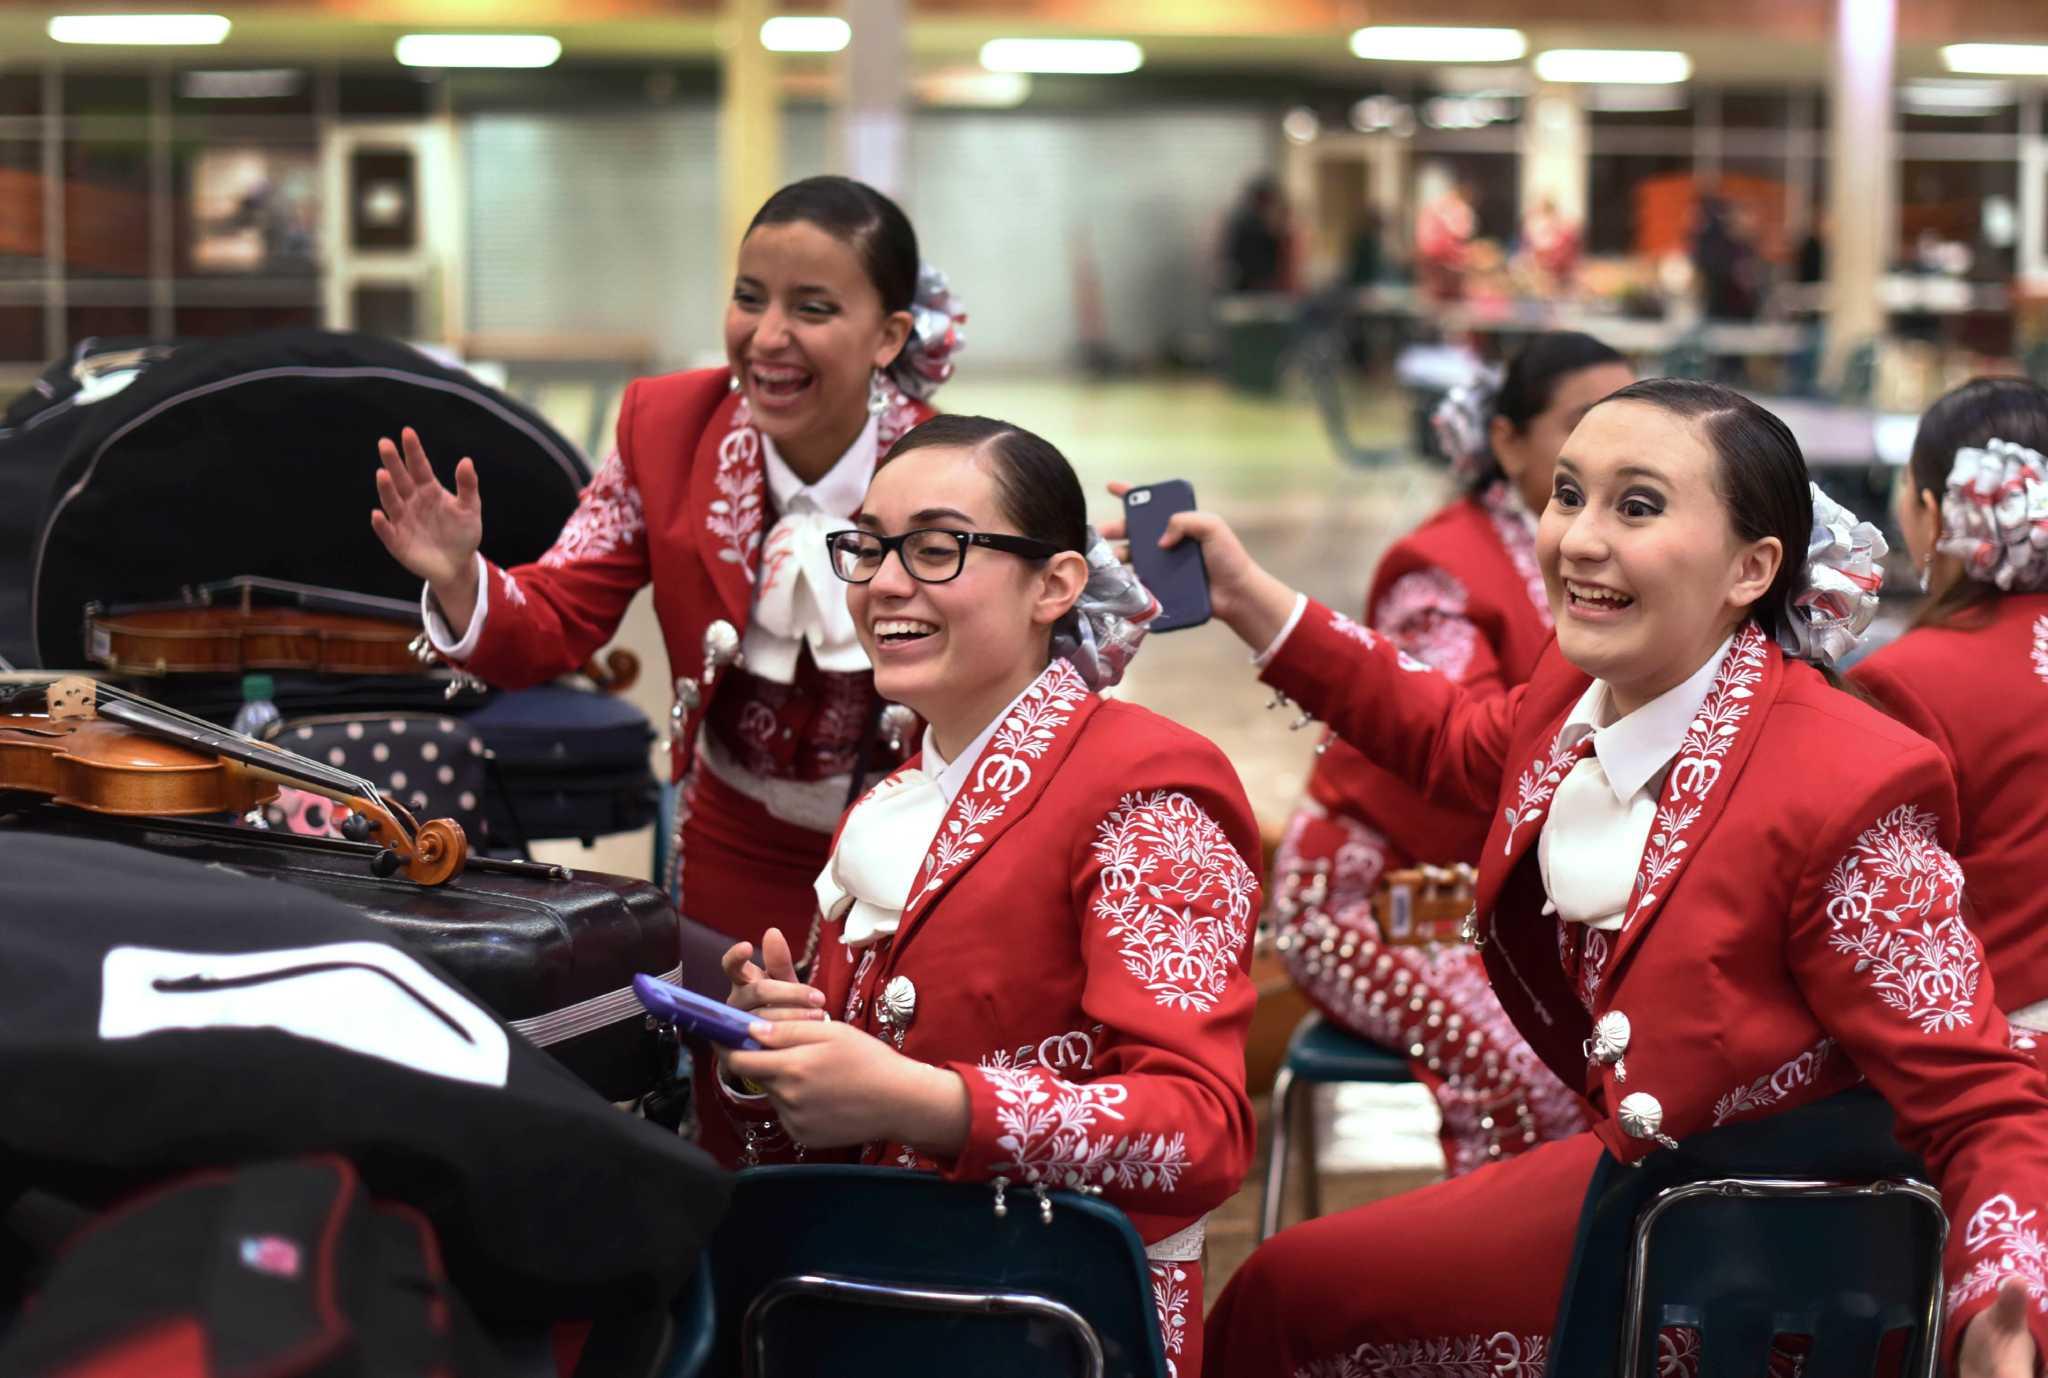 Uil Mariachi Festival In San Antonio Attracts High Schools